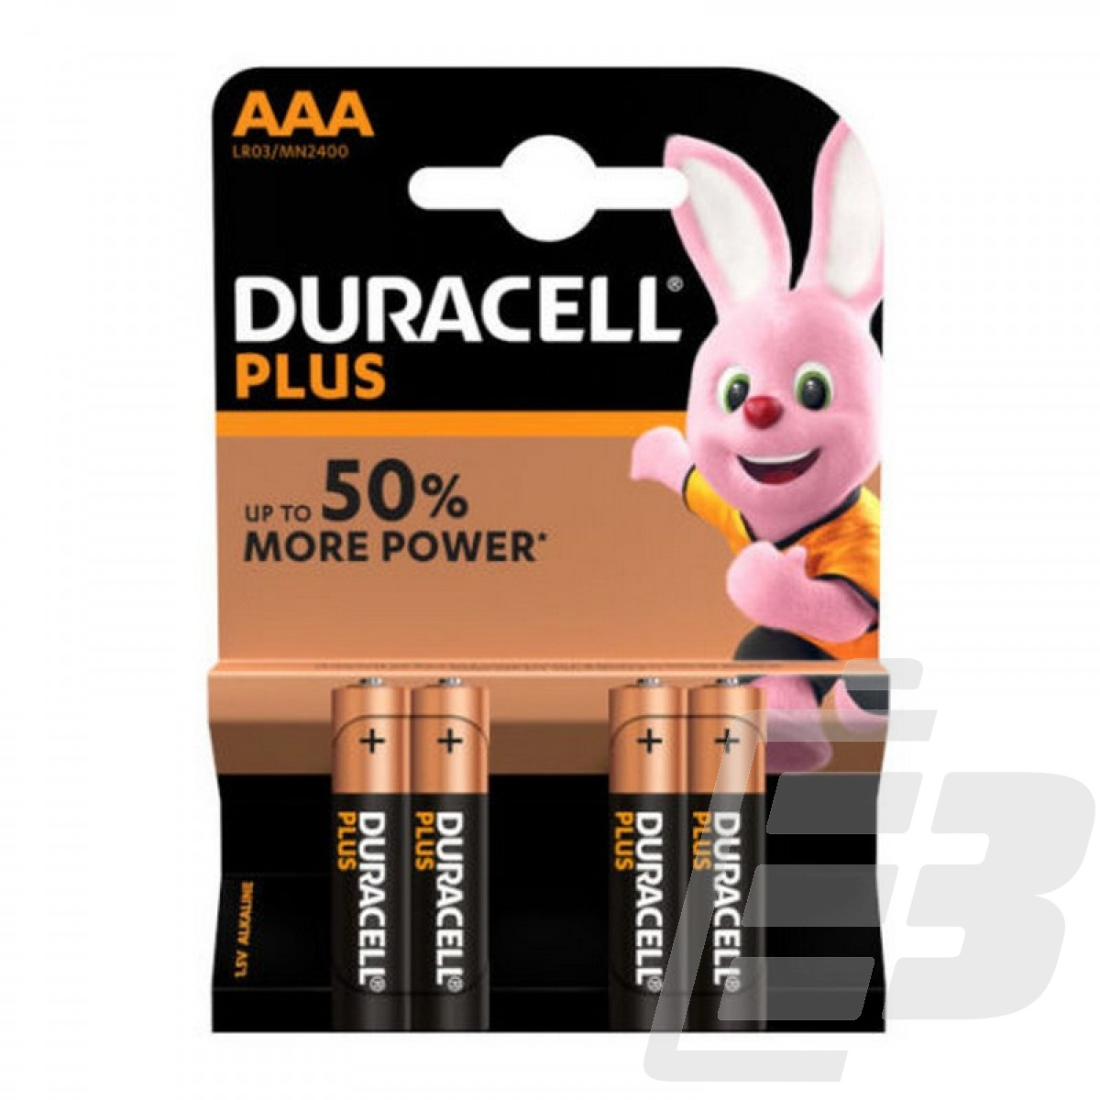 Duracell Plus MN2400 AAA Alkaline battery